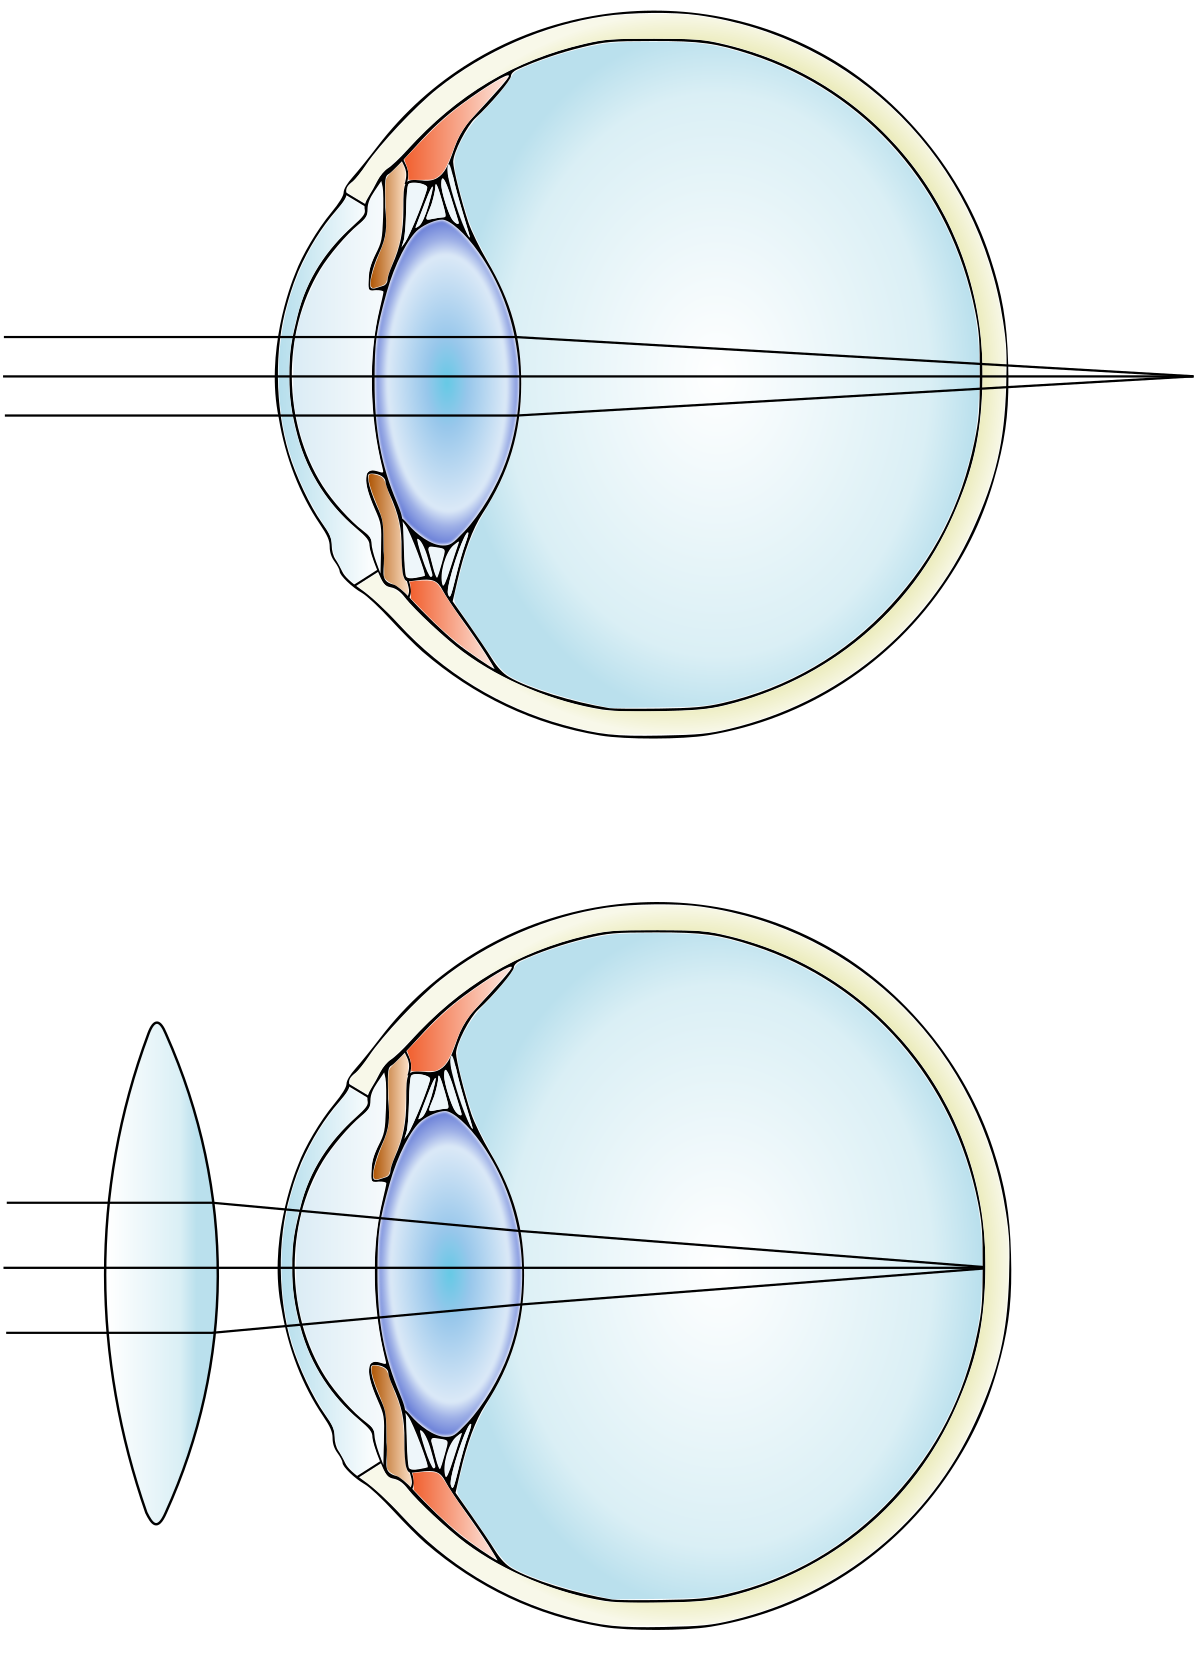 rövidlátás nanotechnológia